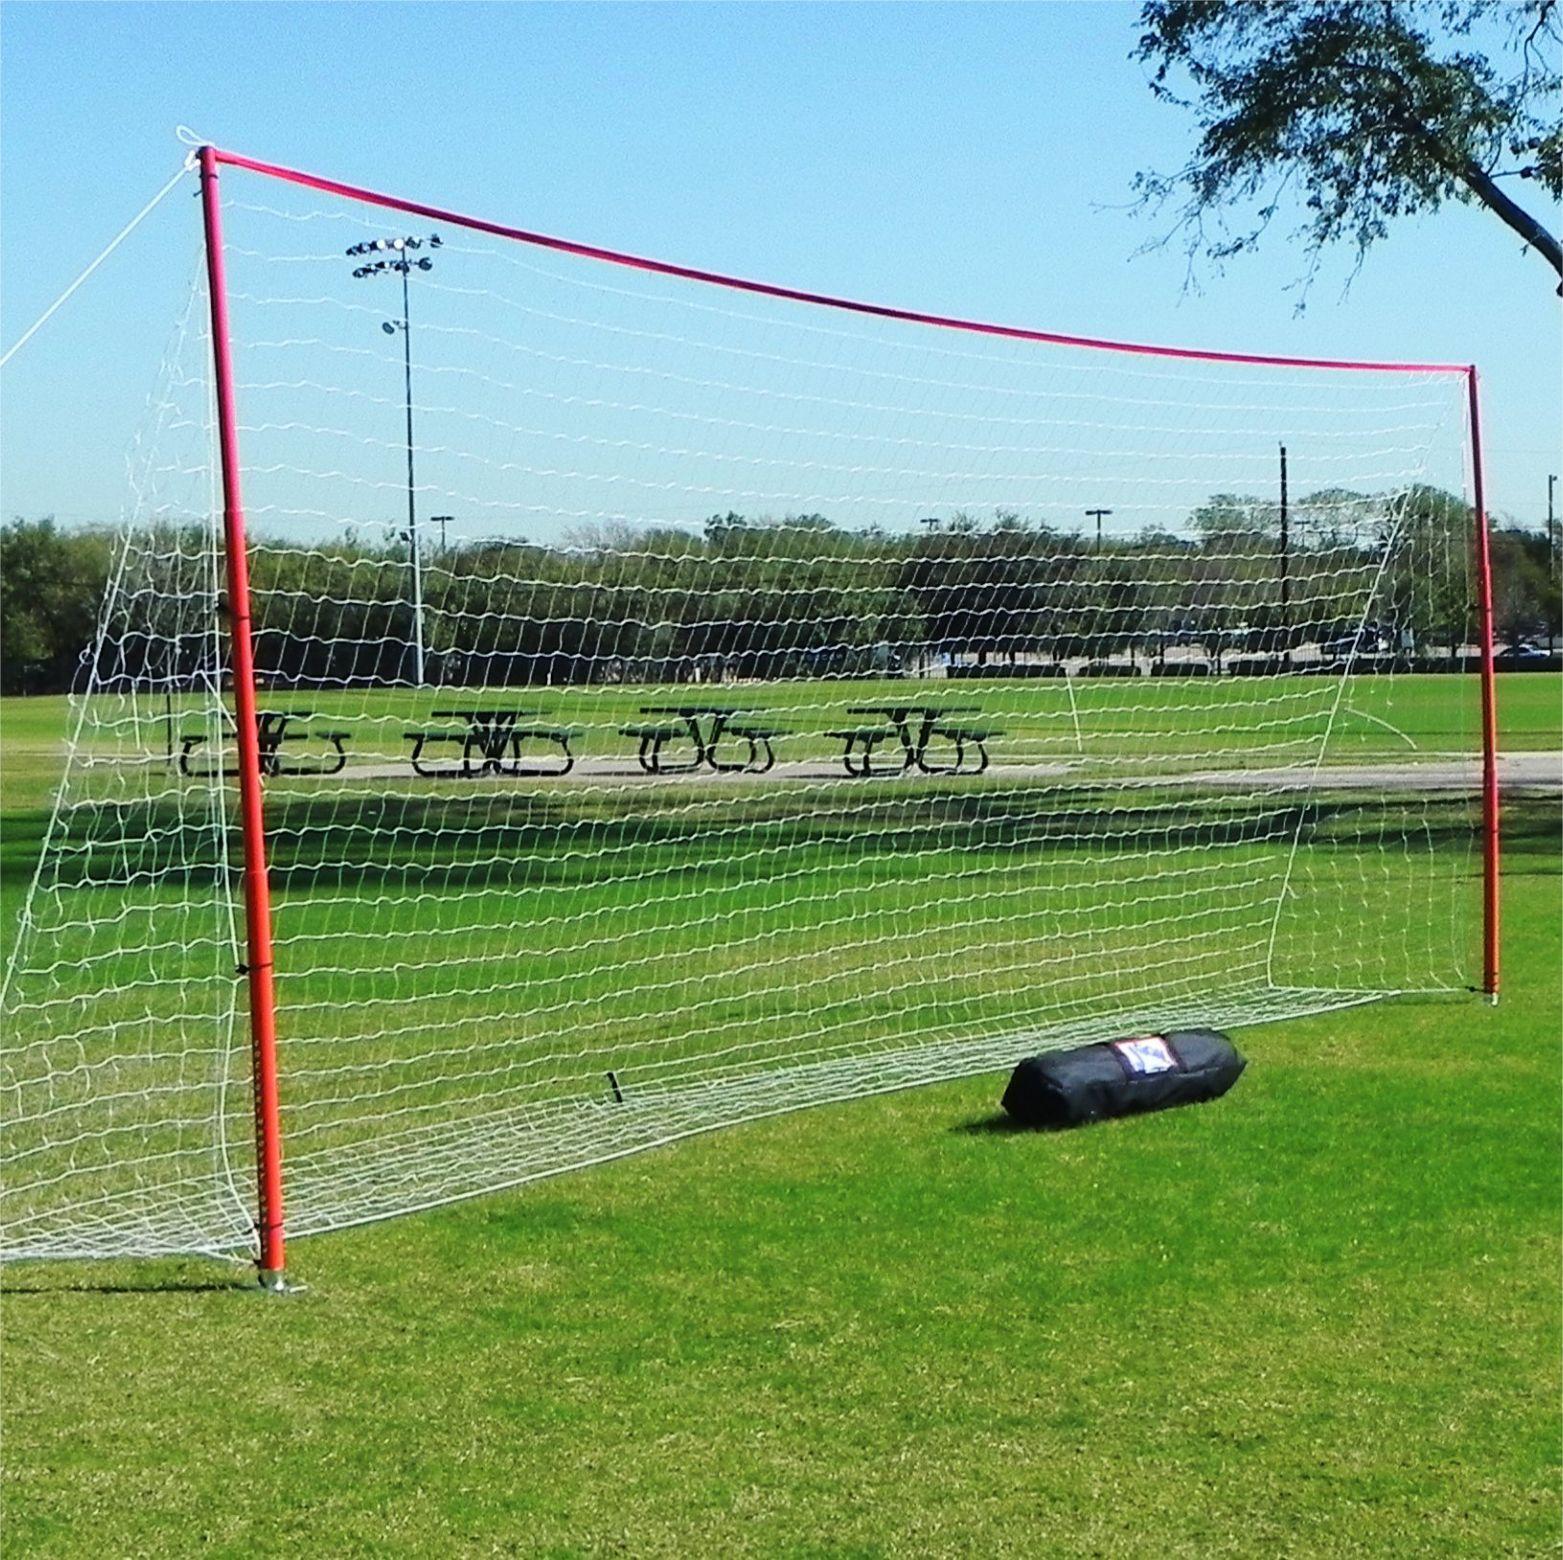 6x18 j-goals por Fútbol innovaciones   Portátil objetivos para el deporte   Patio objetivo